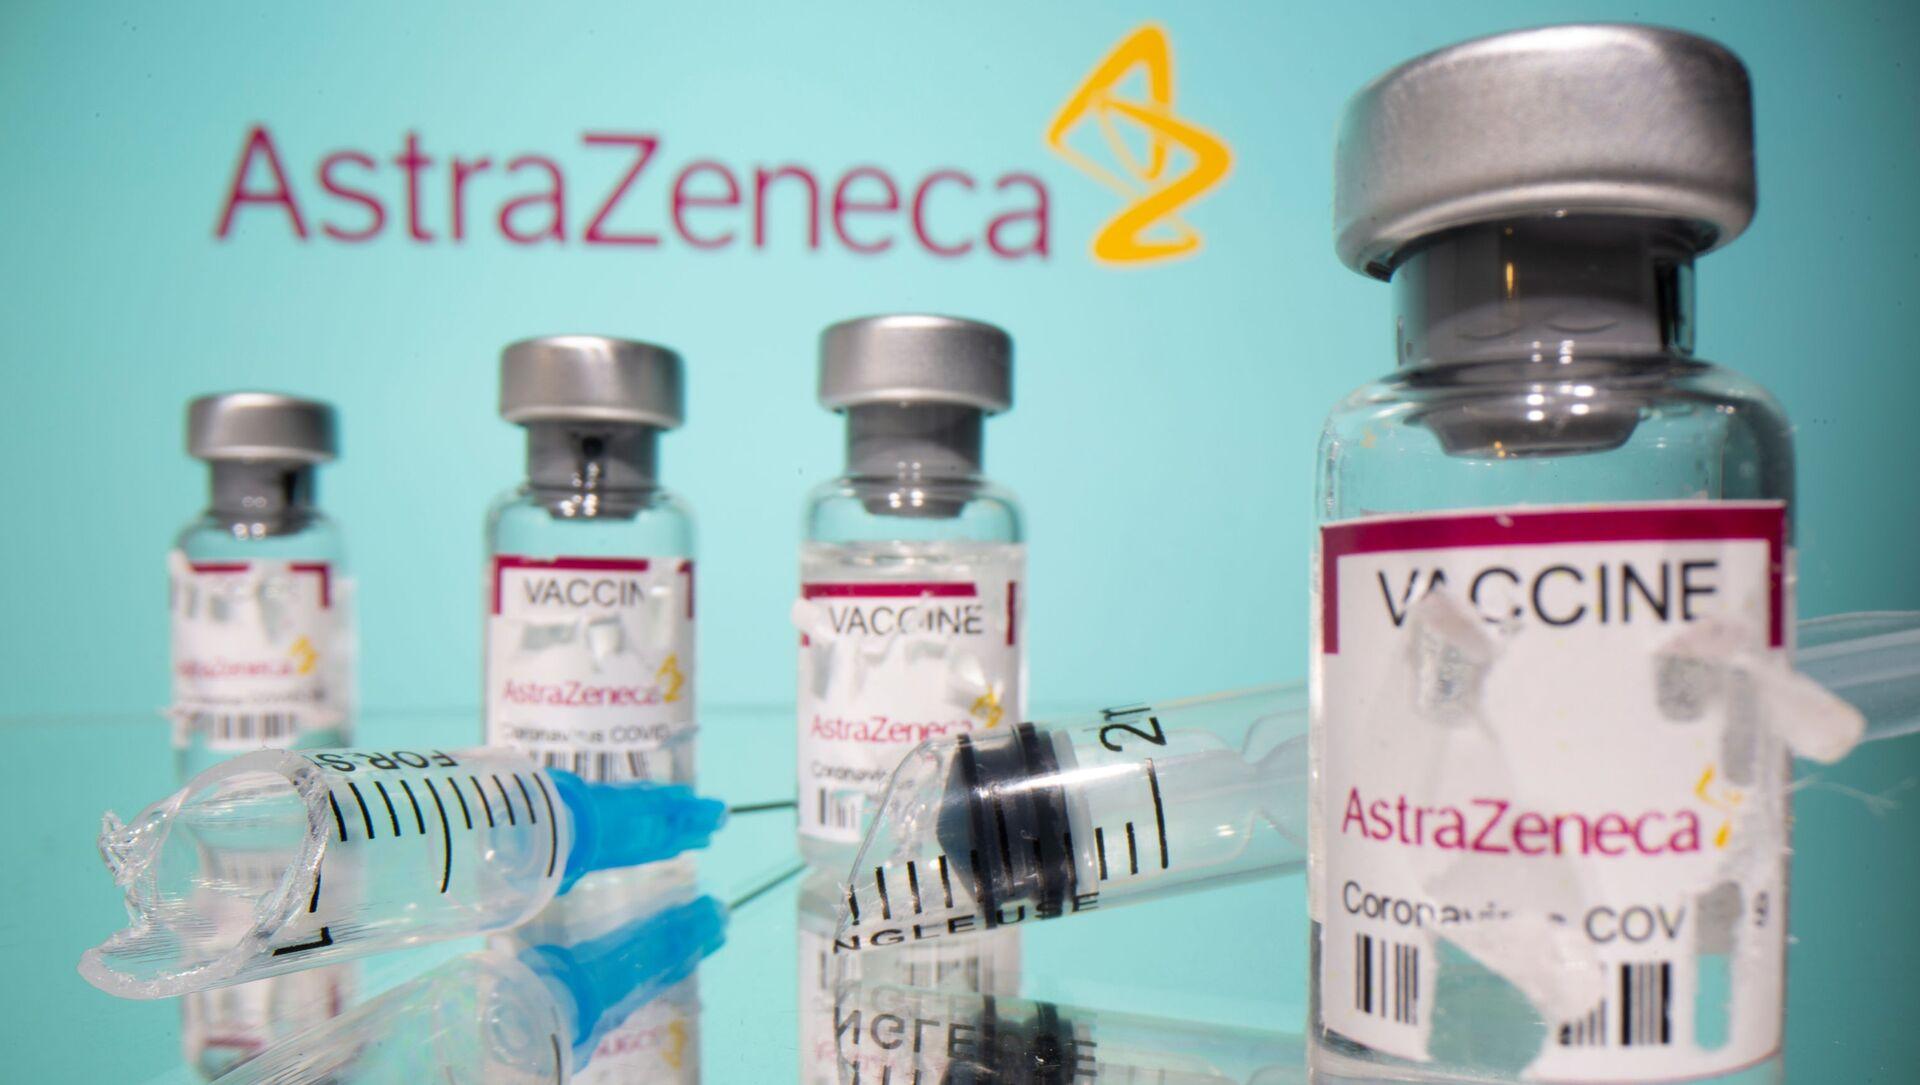 Vaccin AstraZeneca - Sputnik France, 1920, 06.04.2021